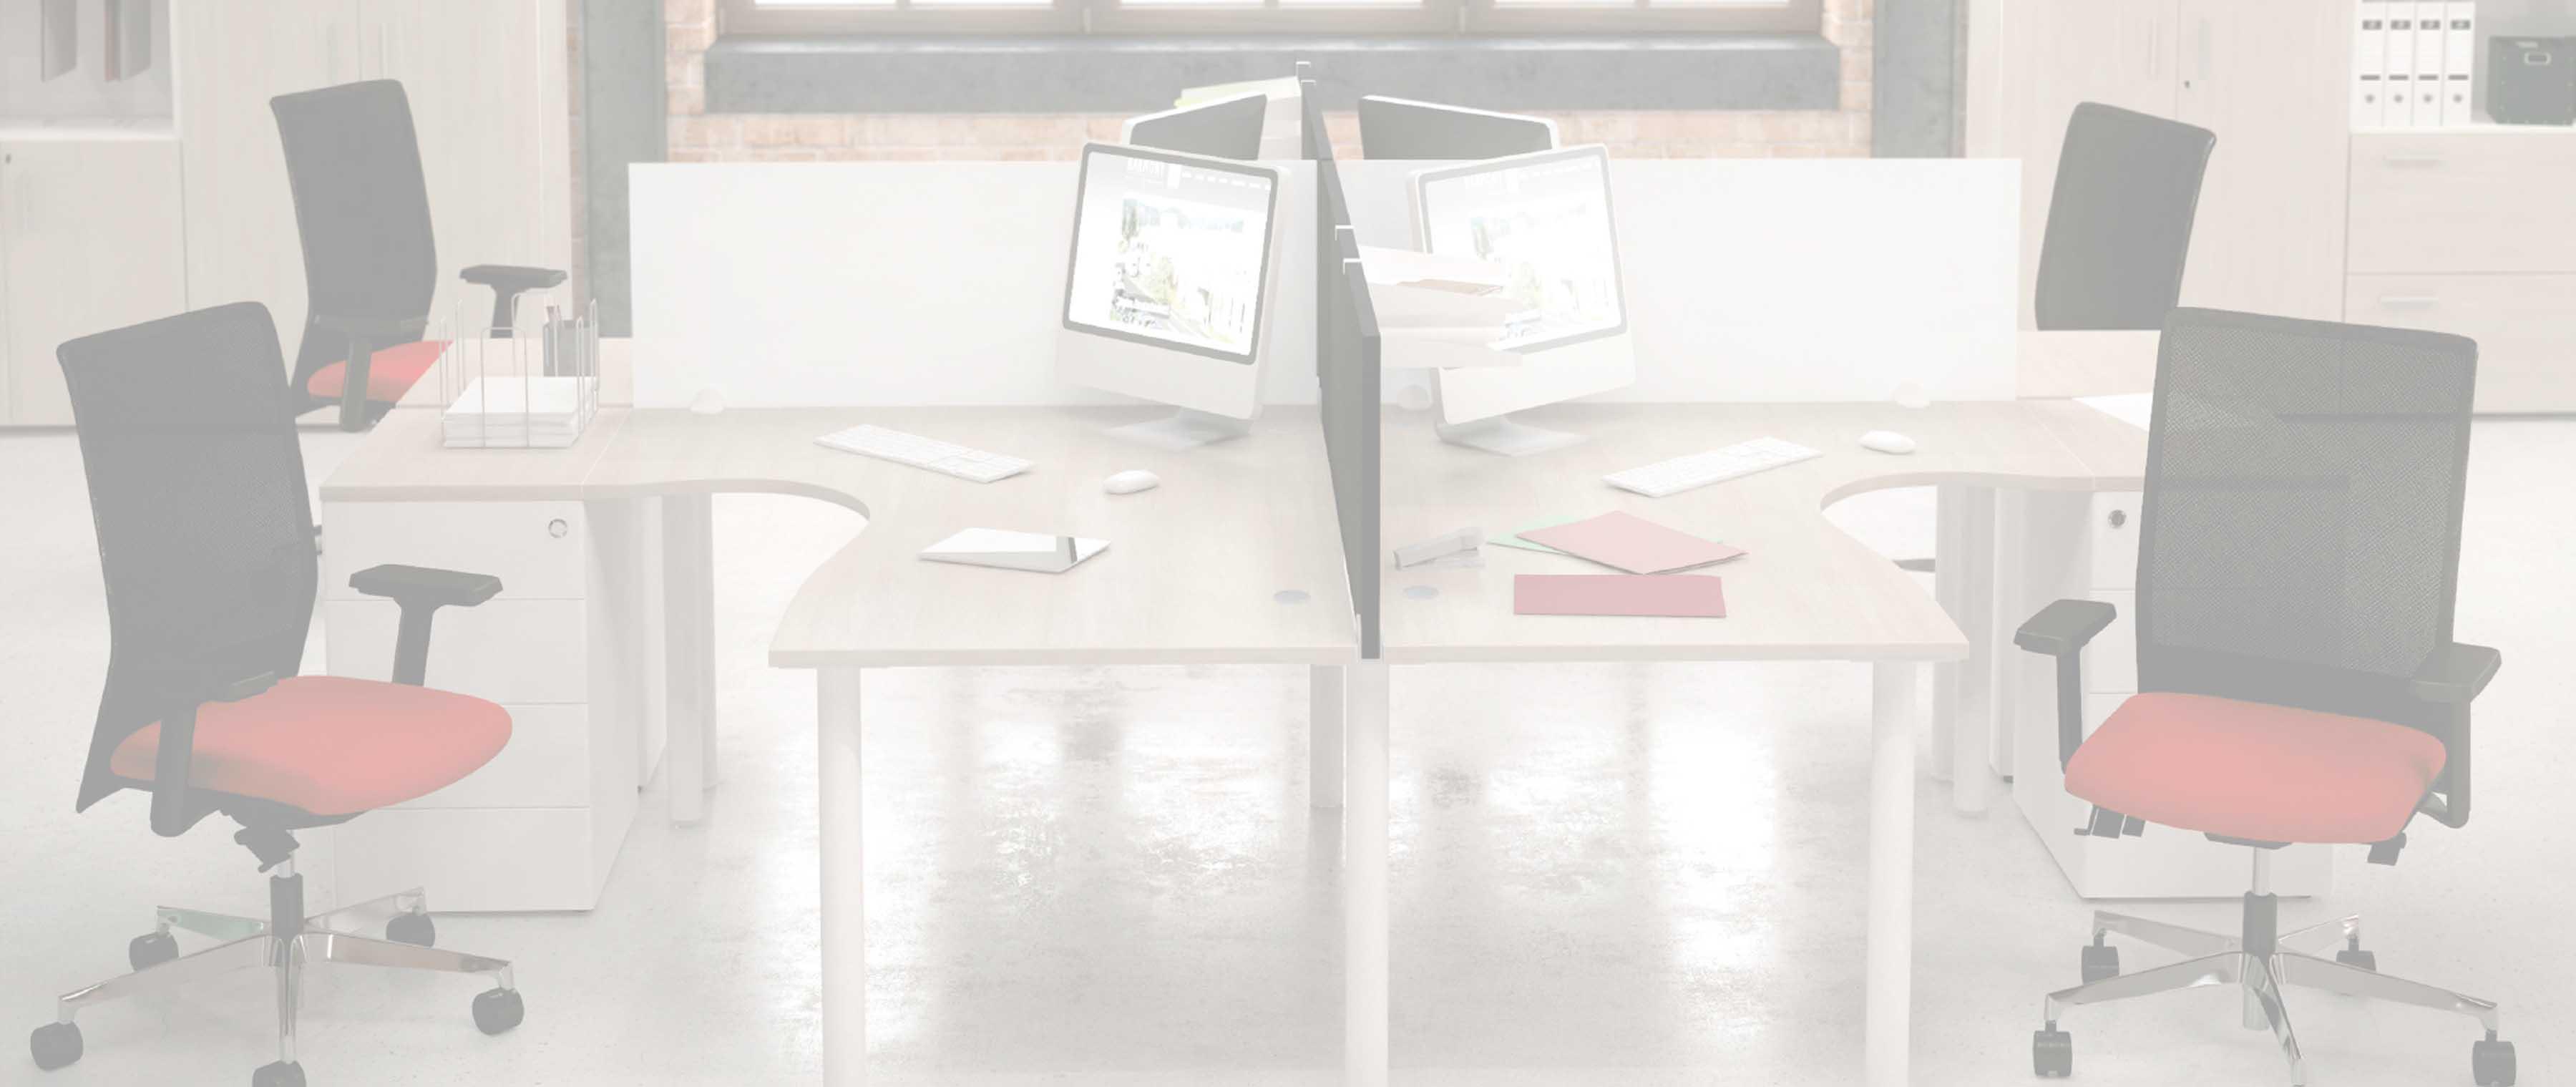 Un bureau complet